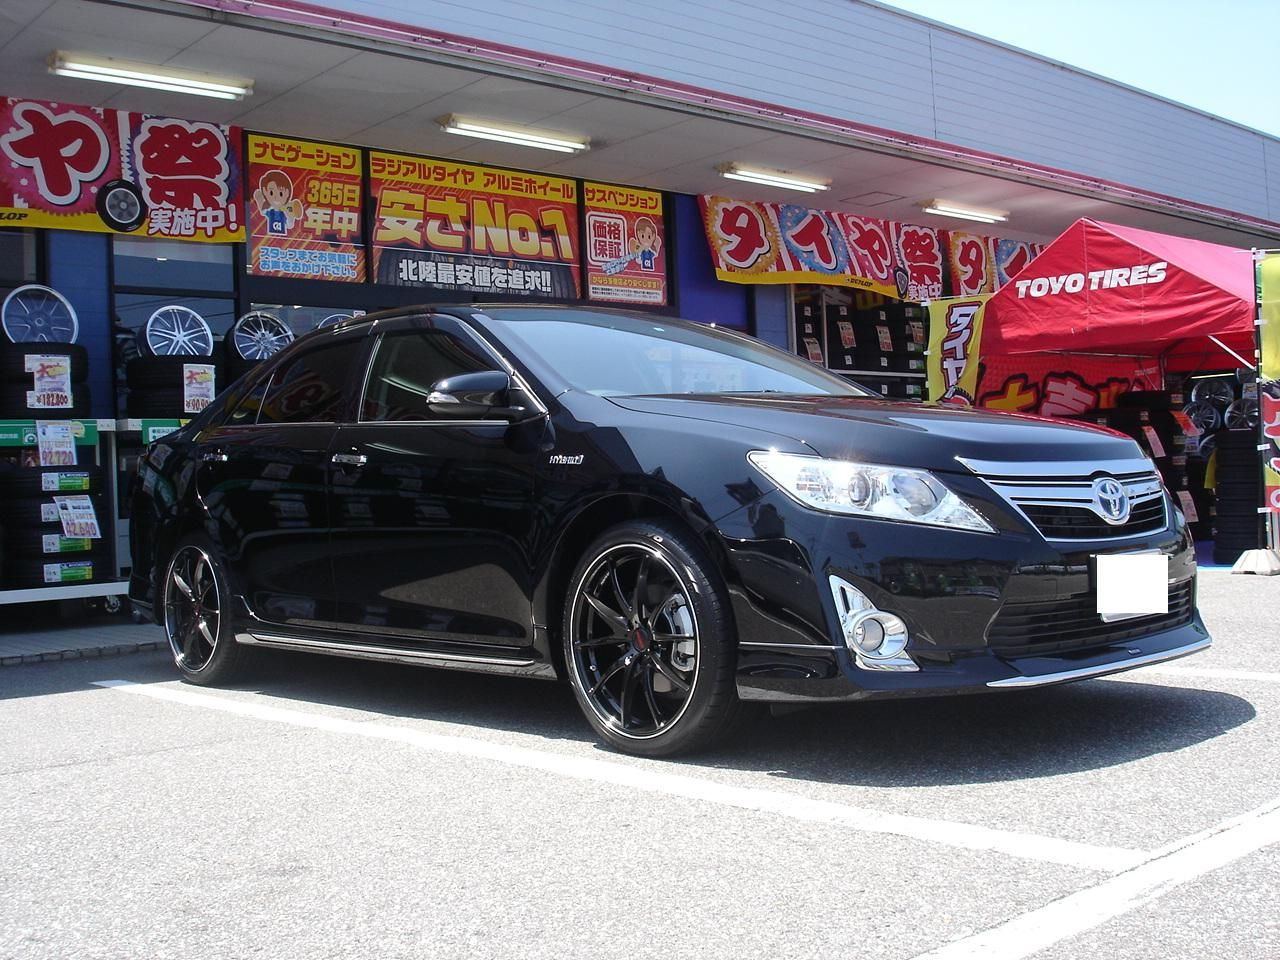 VX Diesel Automatic | LandCruiser 200 | Toyota Australia